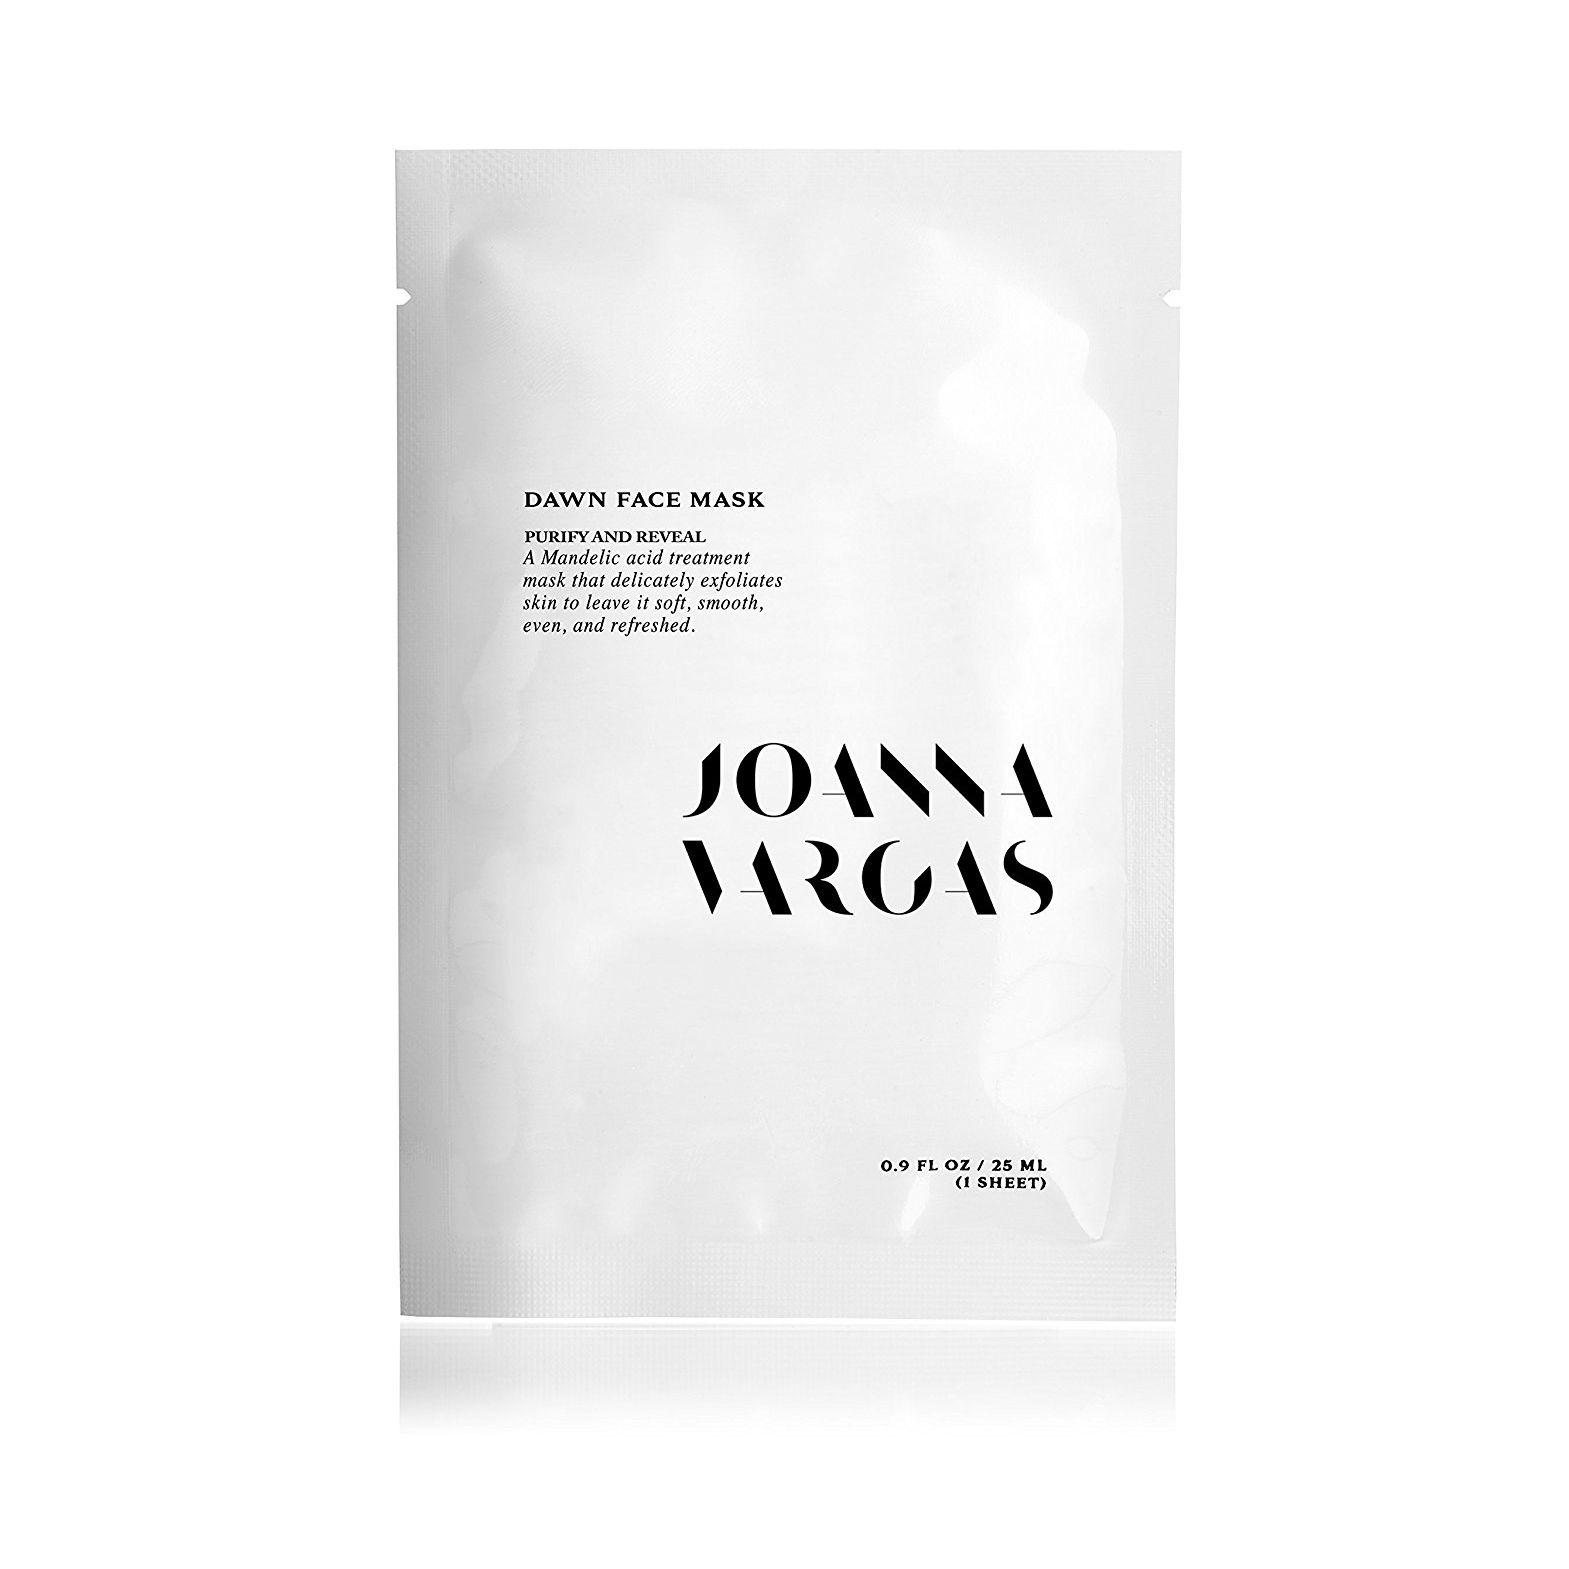 Joanna Vargas Mask